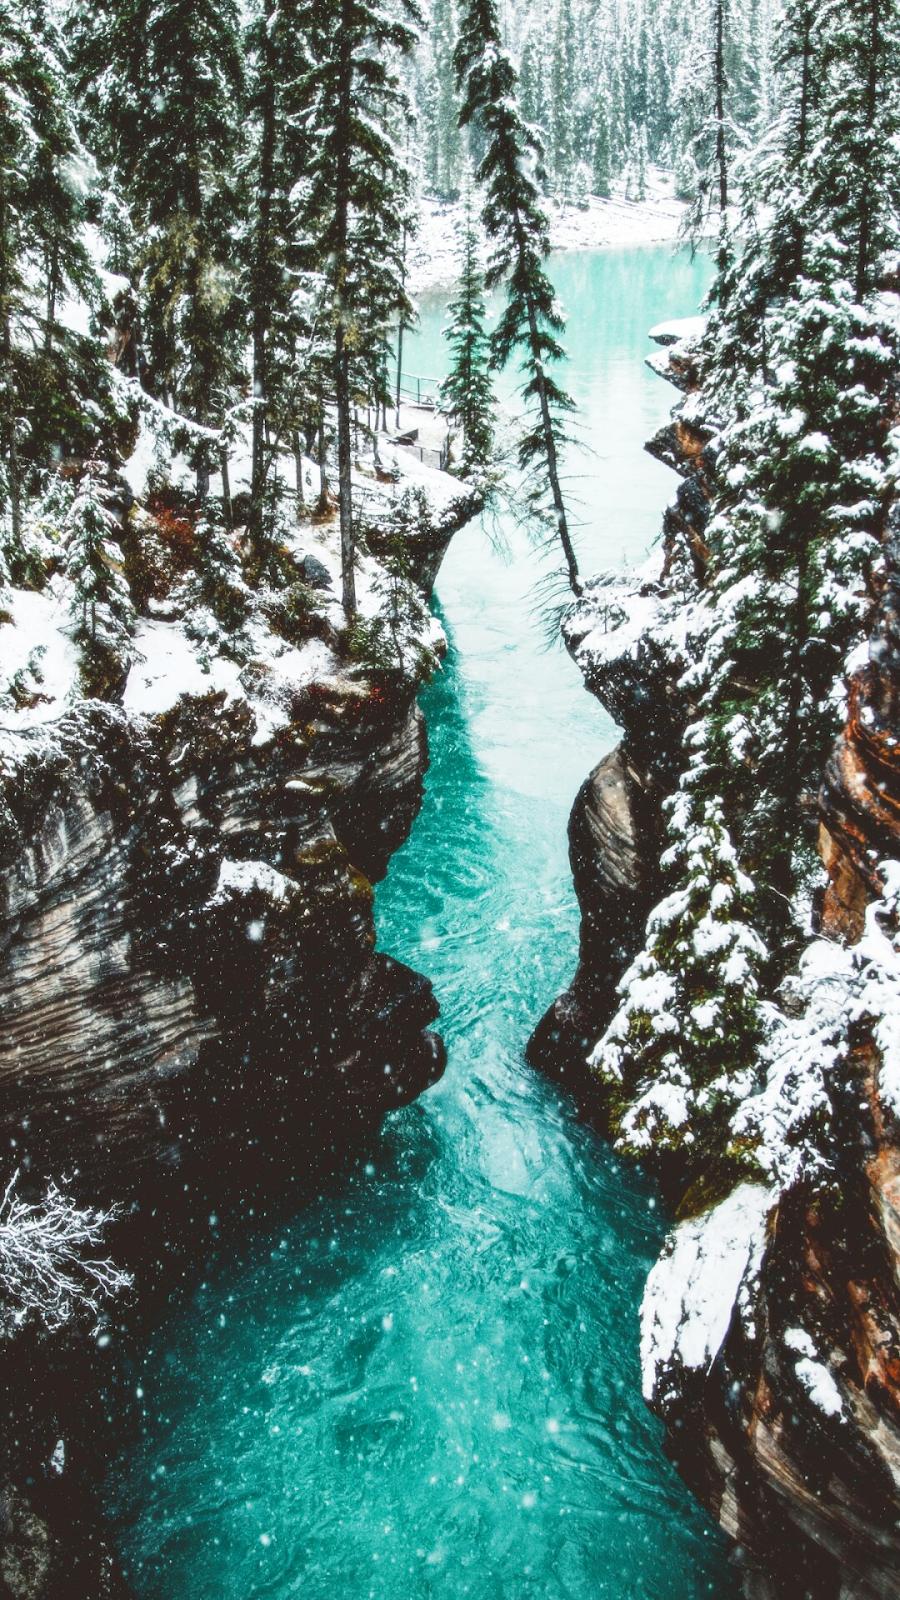 Green lake on winter #winterwallpaper